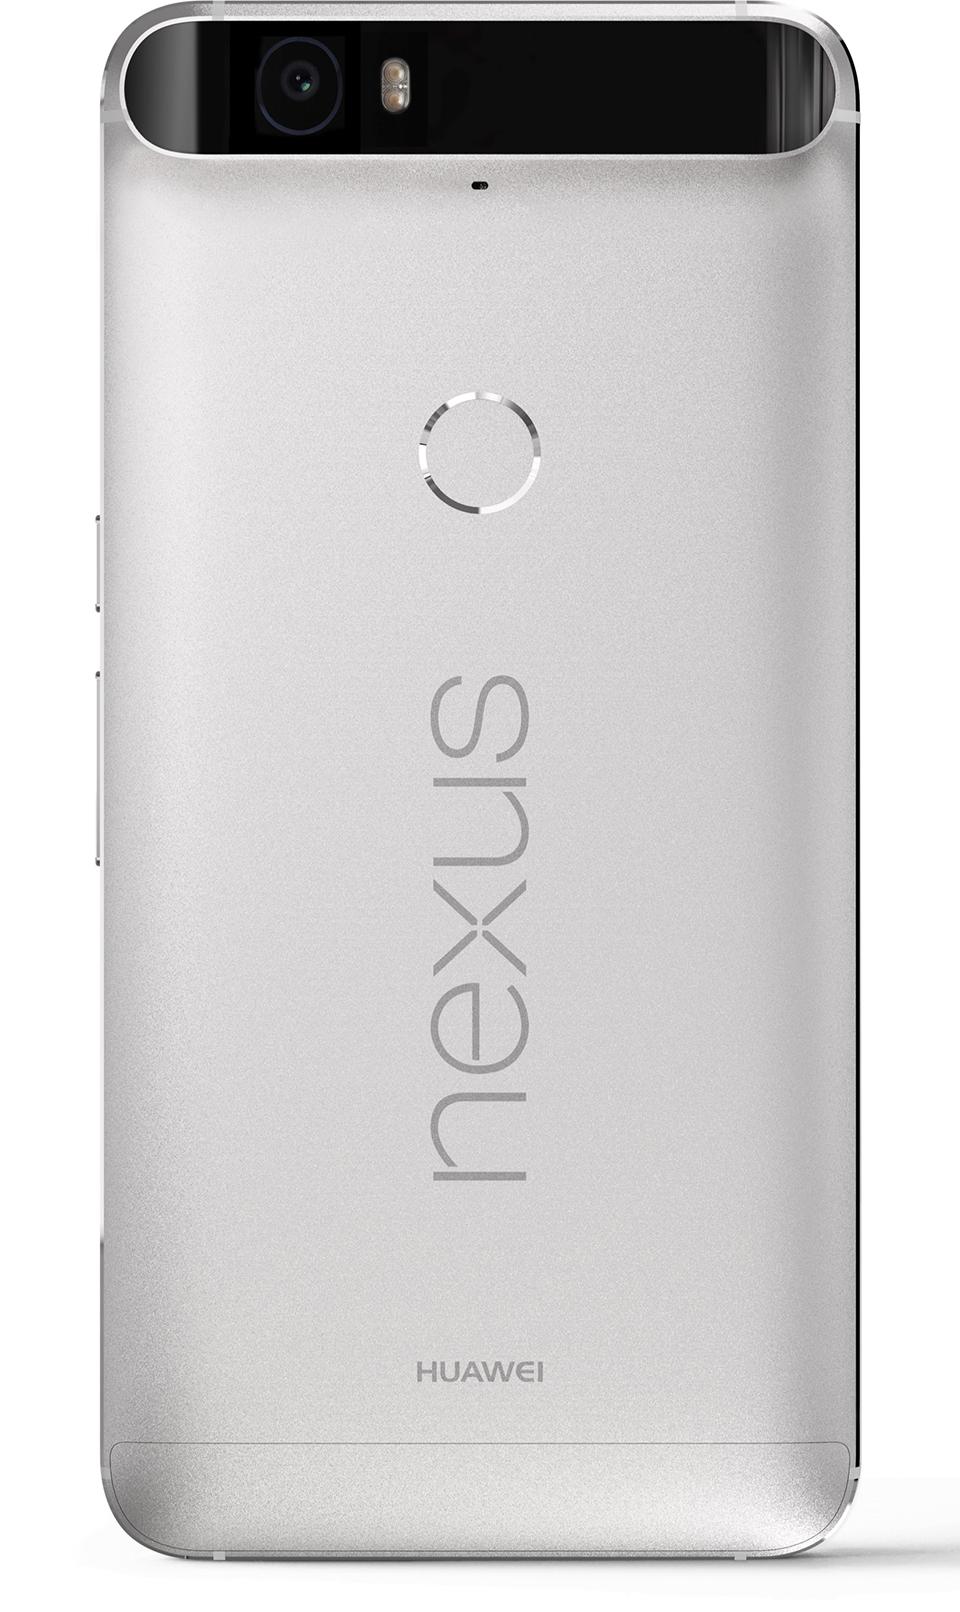 Google Nexus 5X & 6P